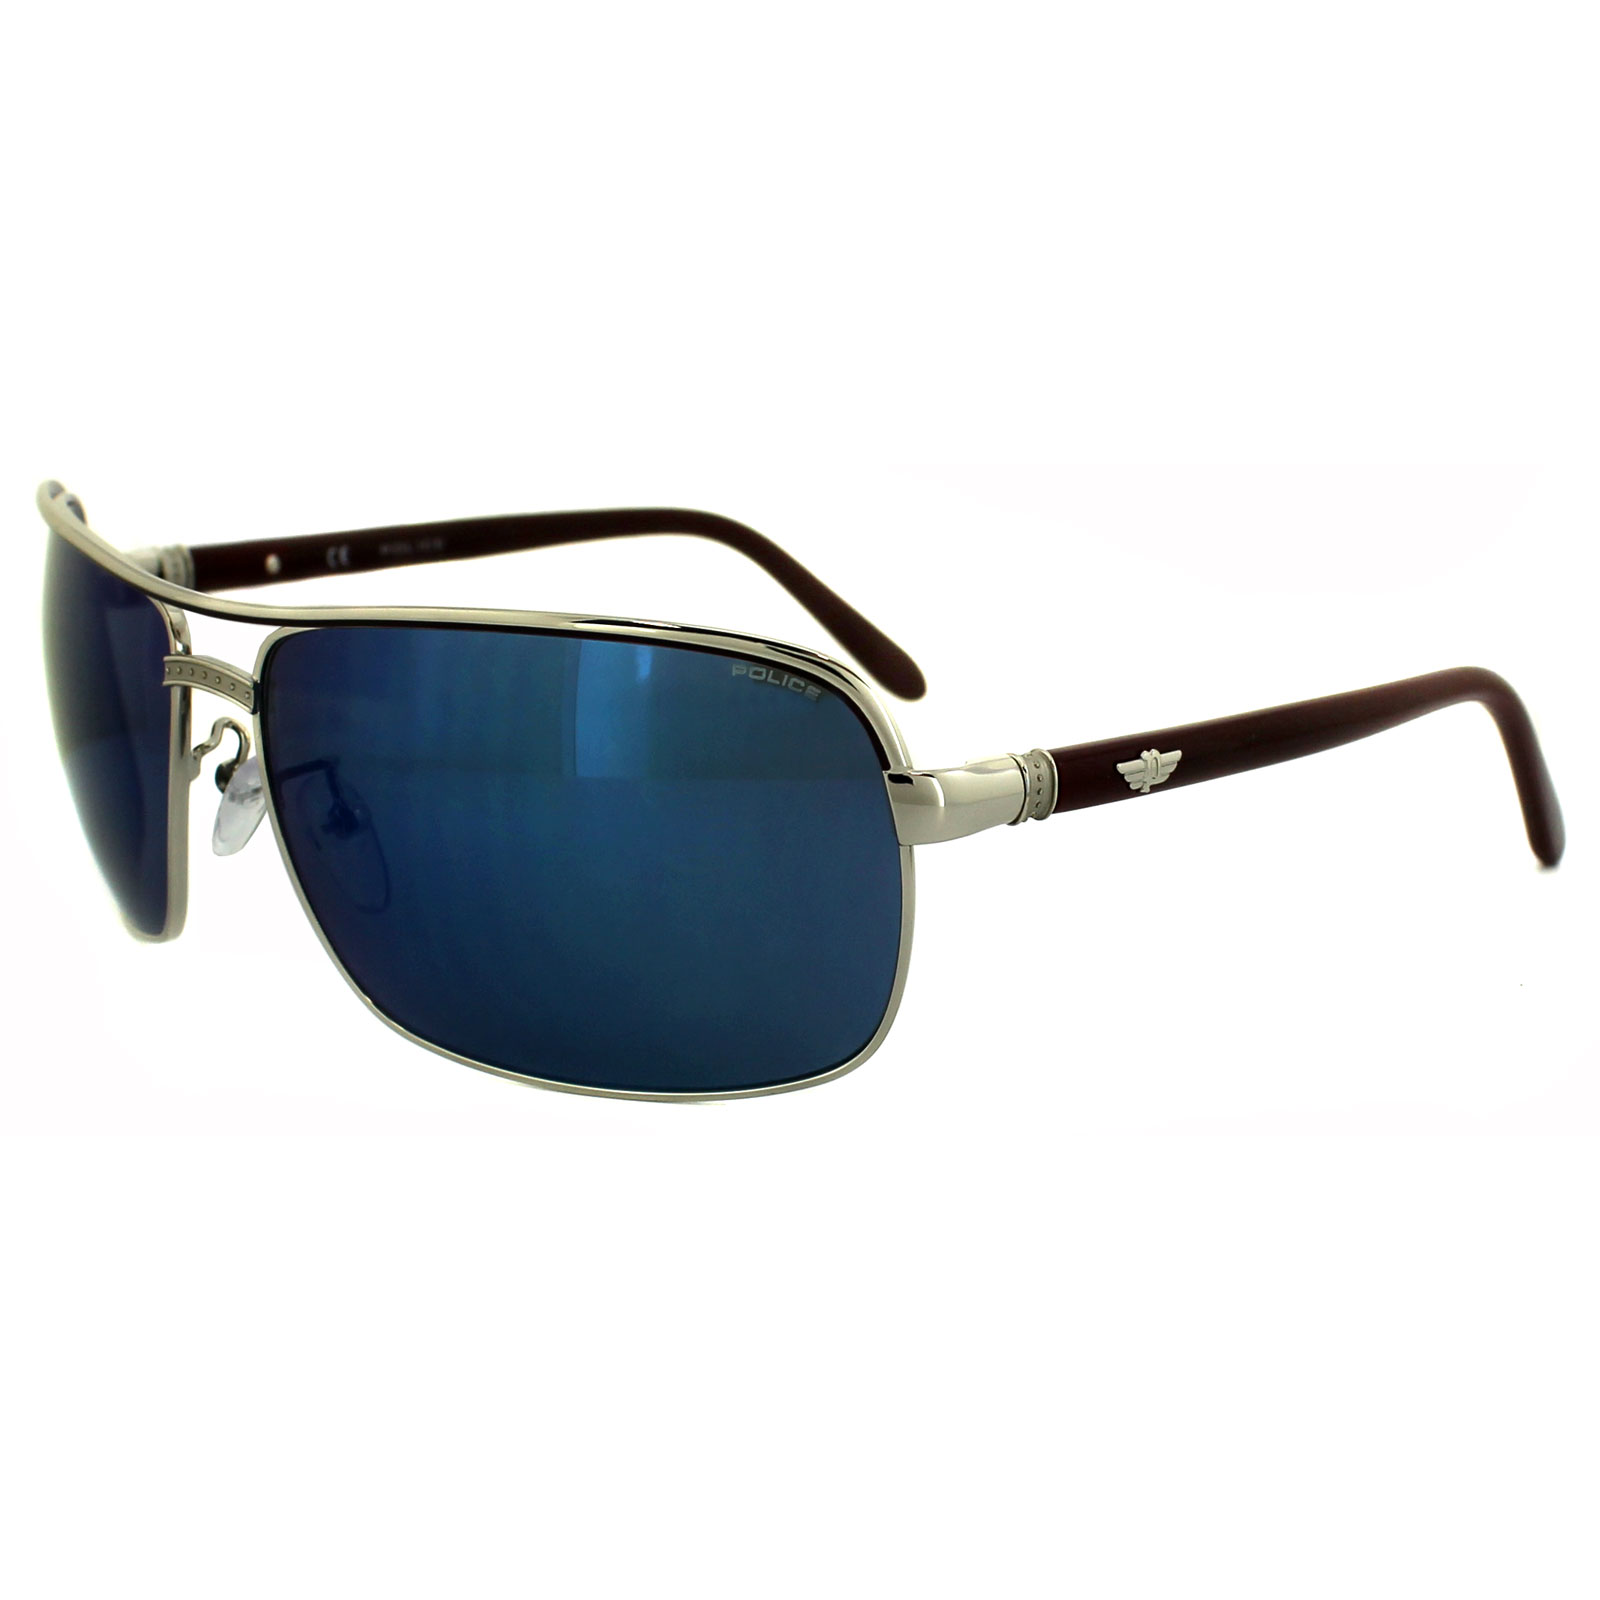 Cheap Police Sunglasses 8852 Discounted Sunglasses